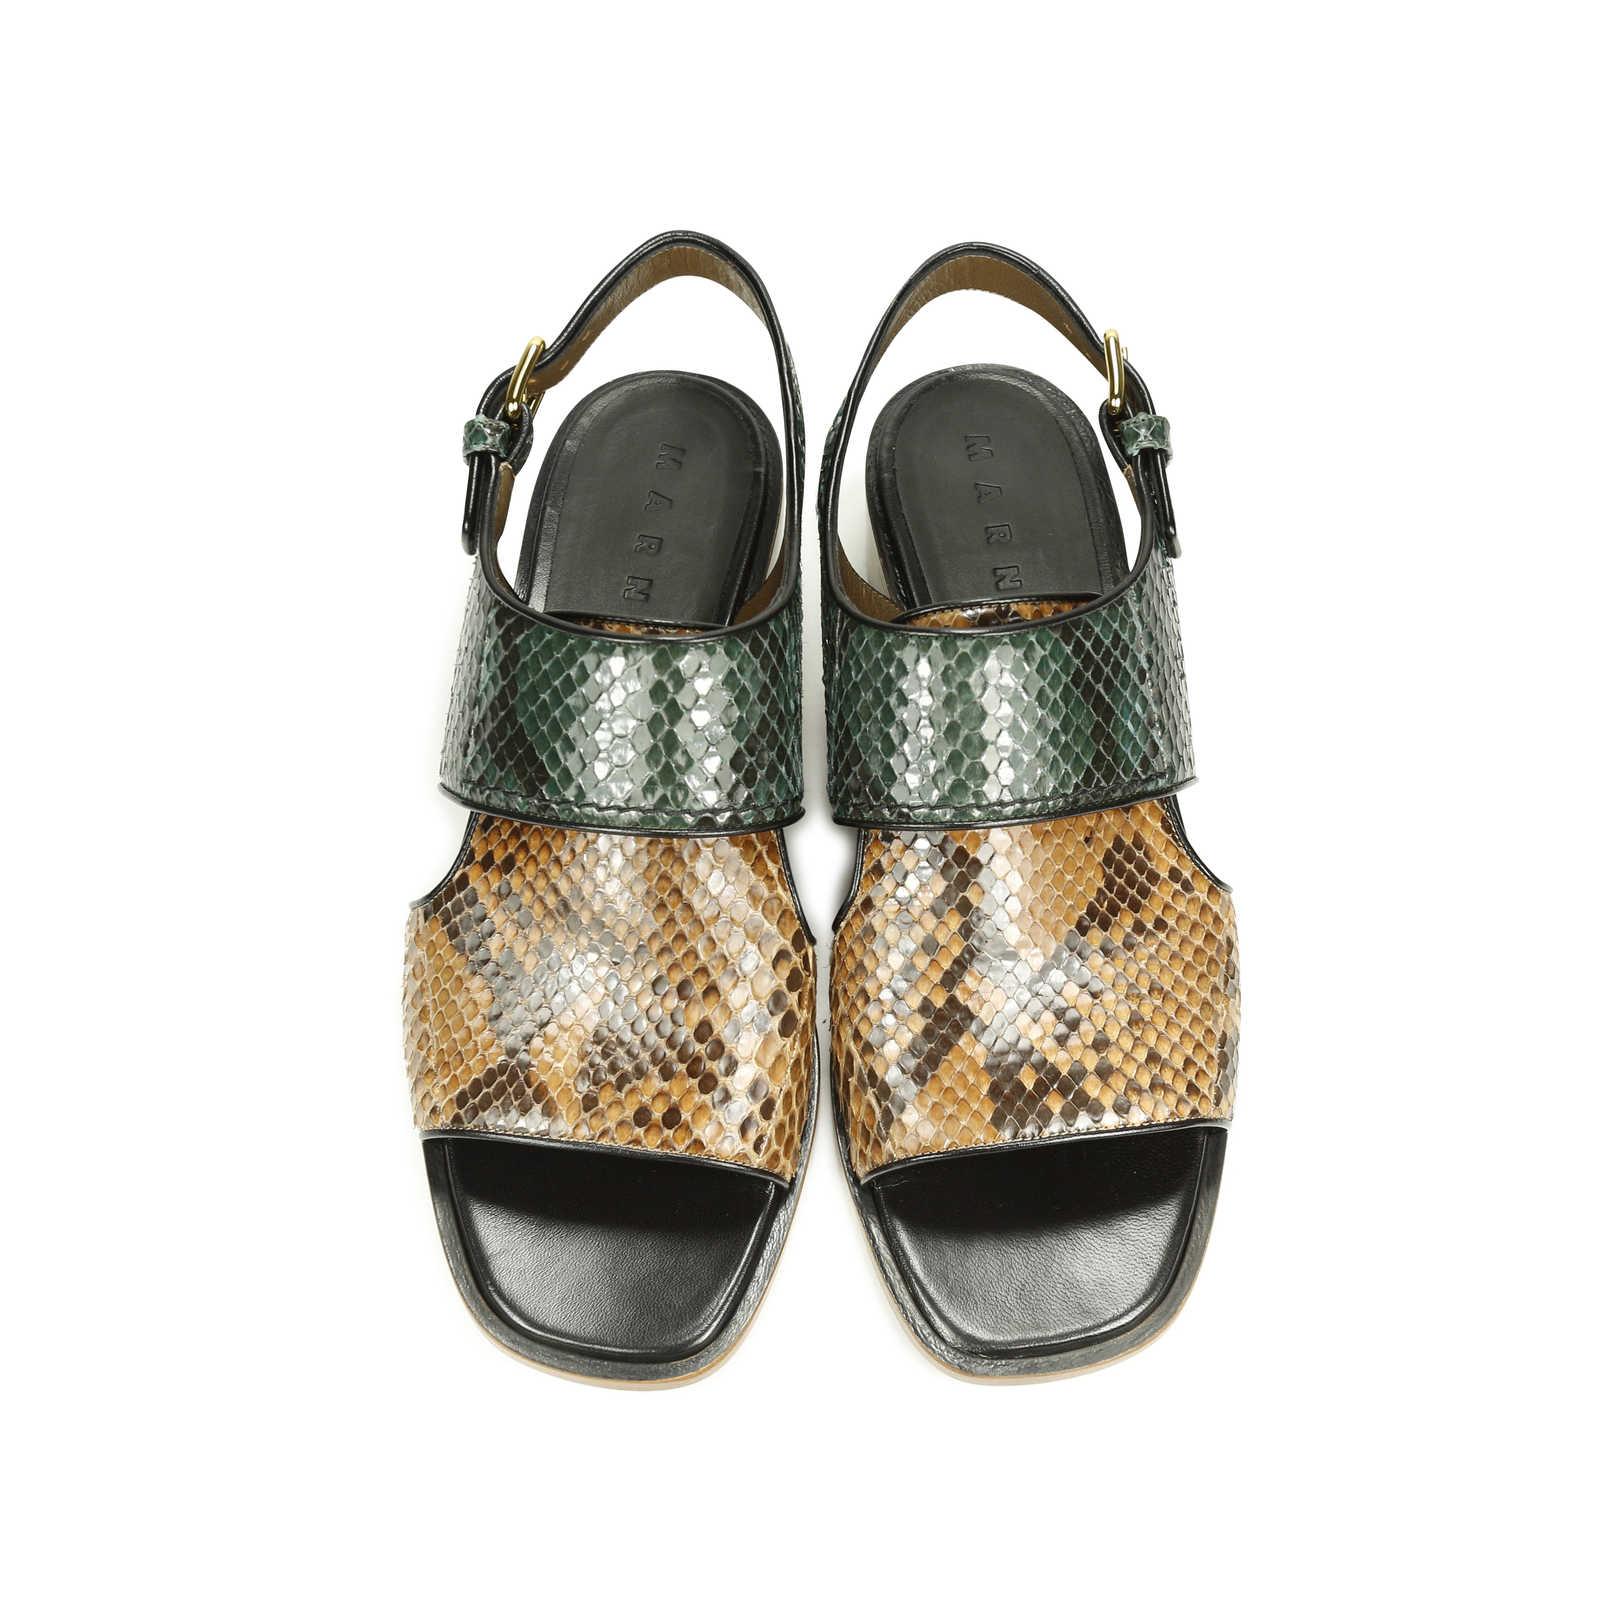 marni-python-magentic-sandals-1.jpg